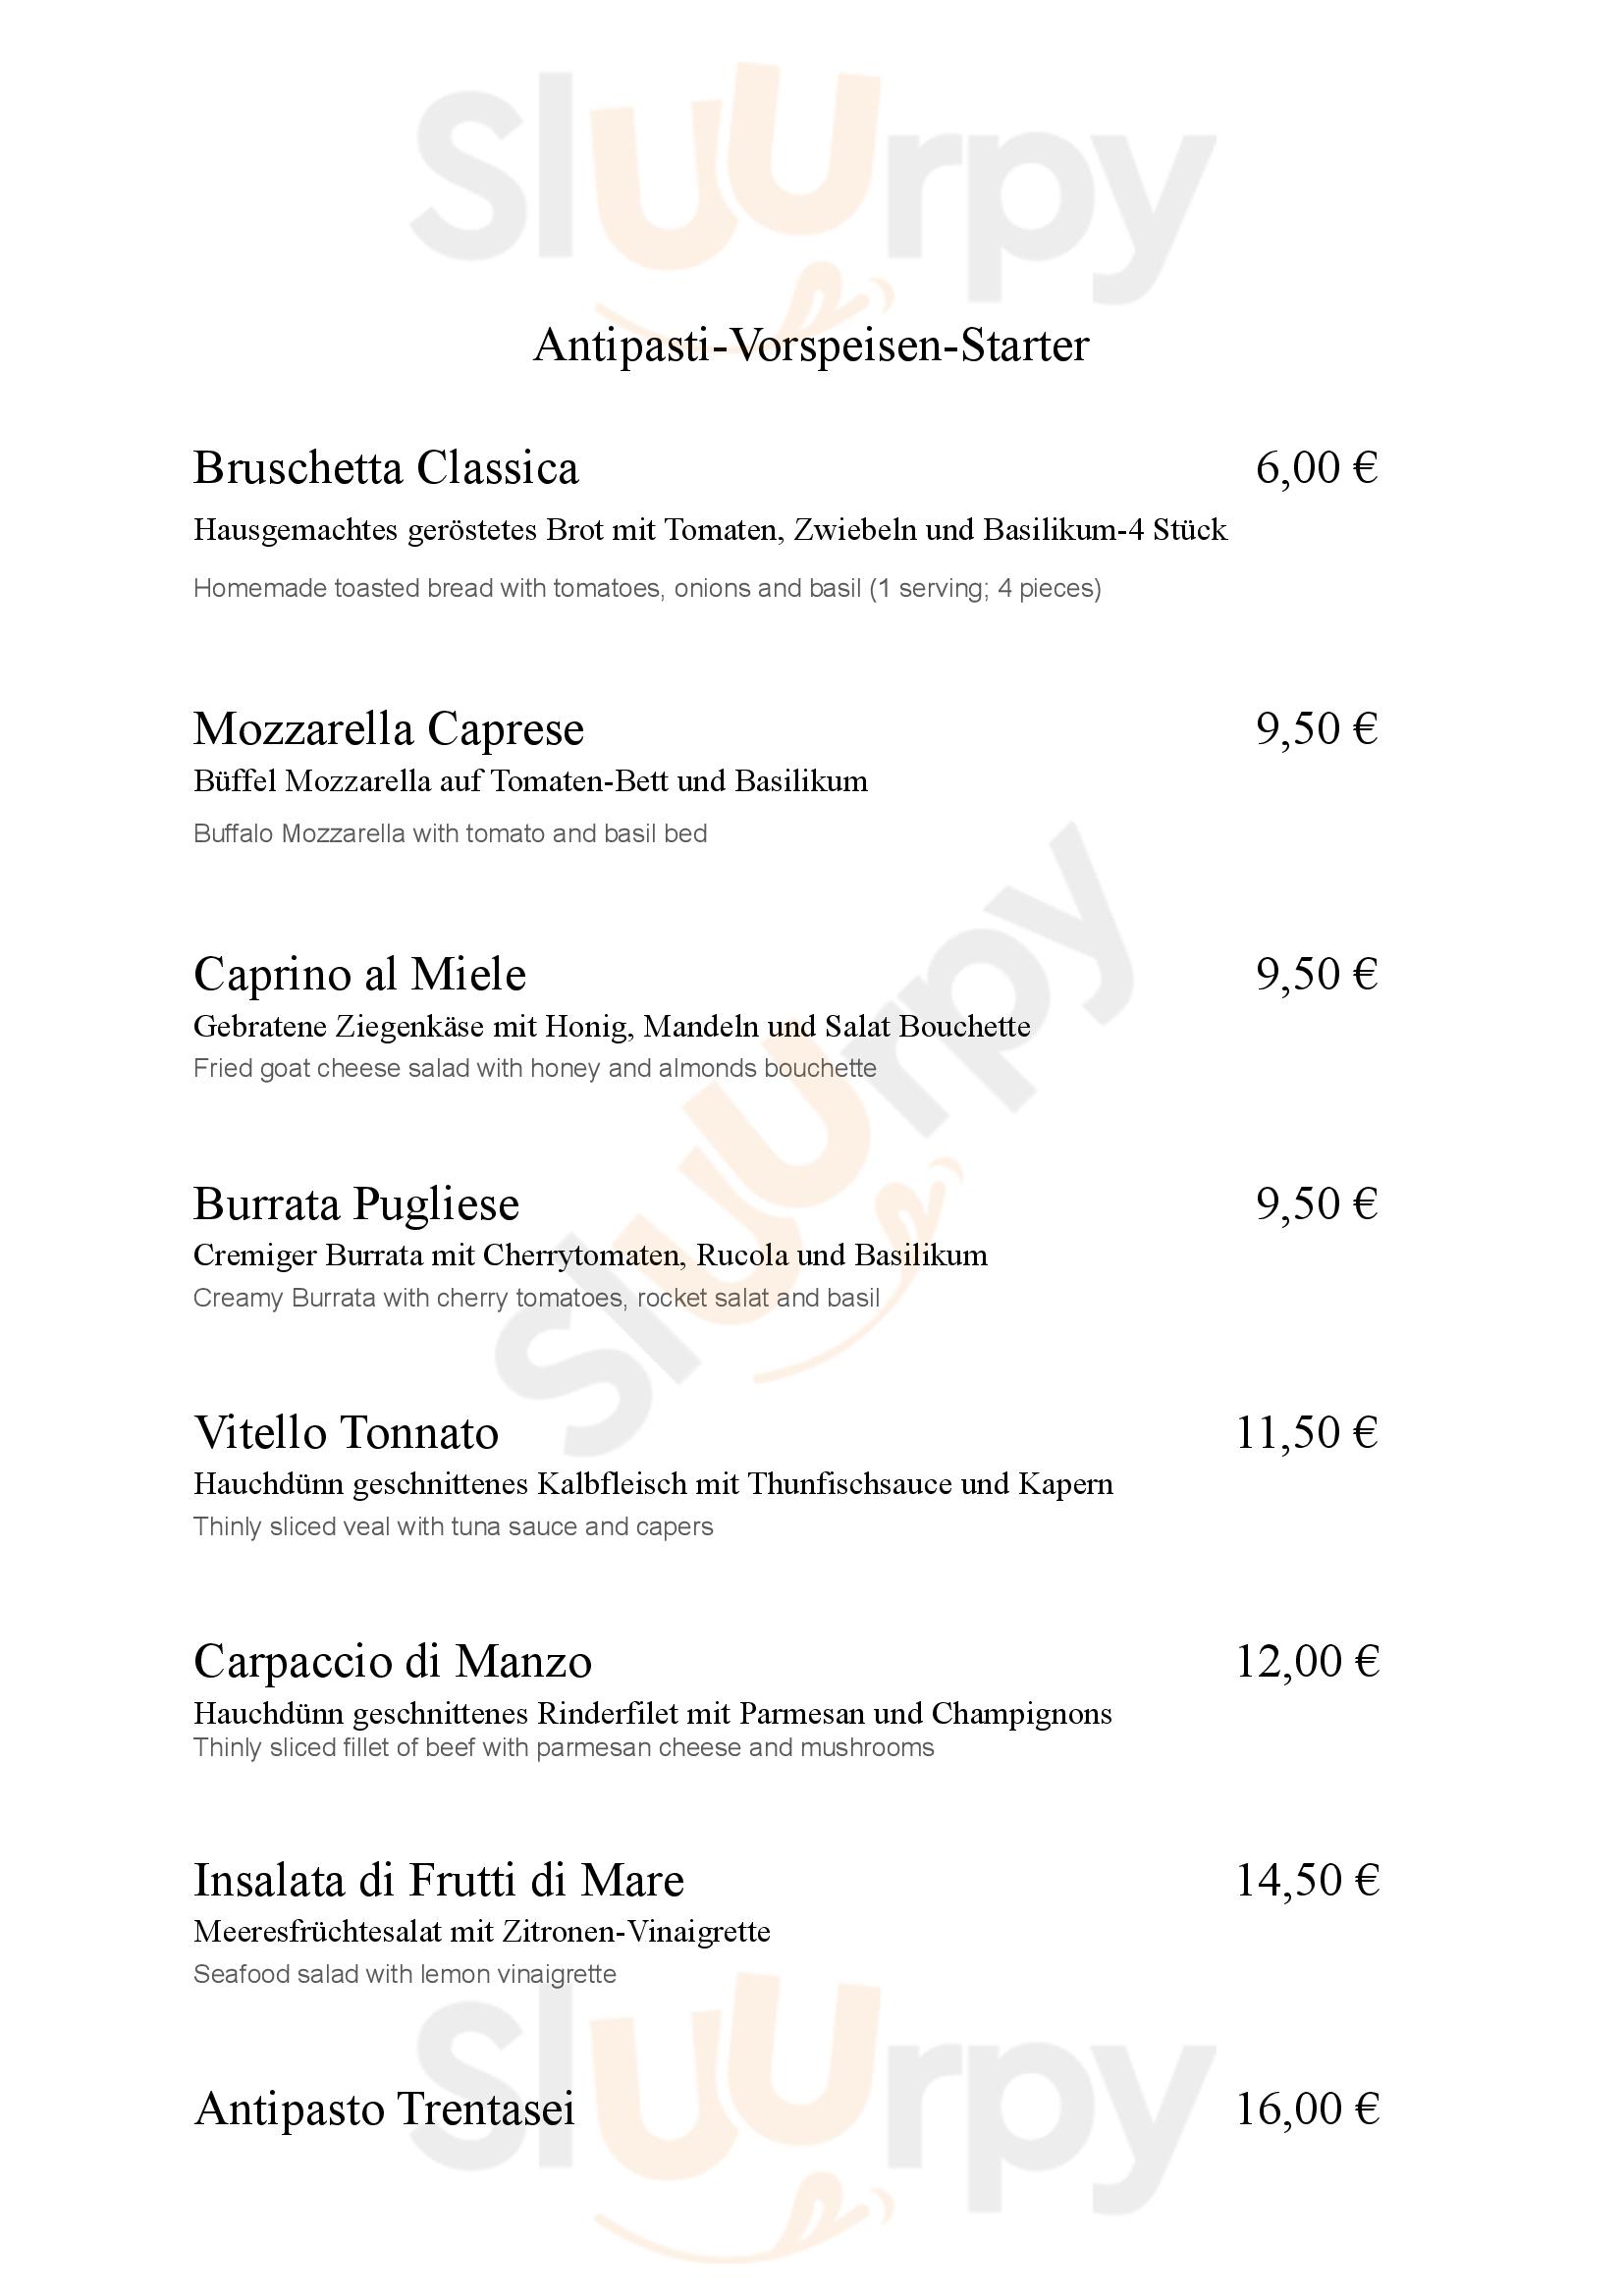 Trentasei Cucina Italiana Berlin menù - pagina 1